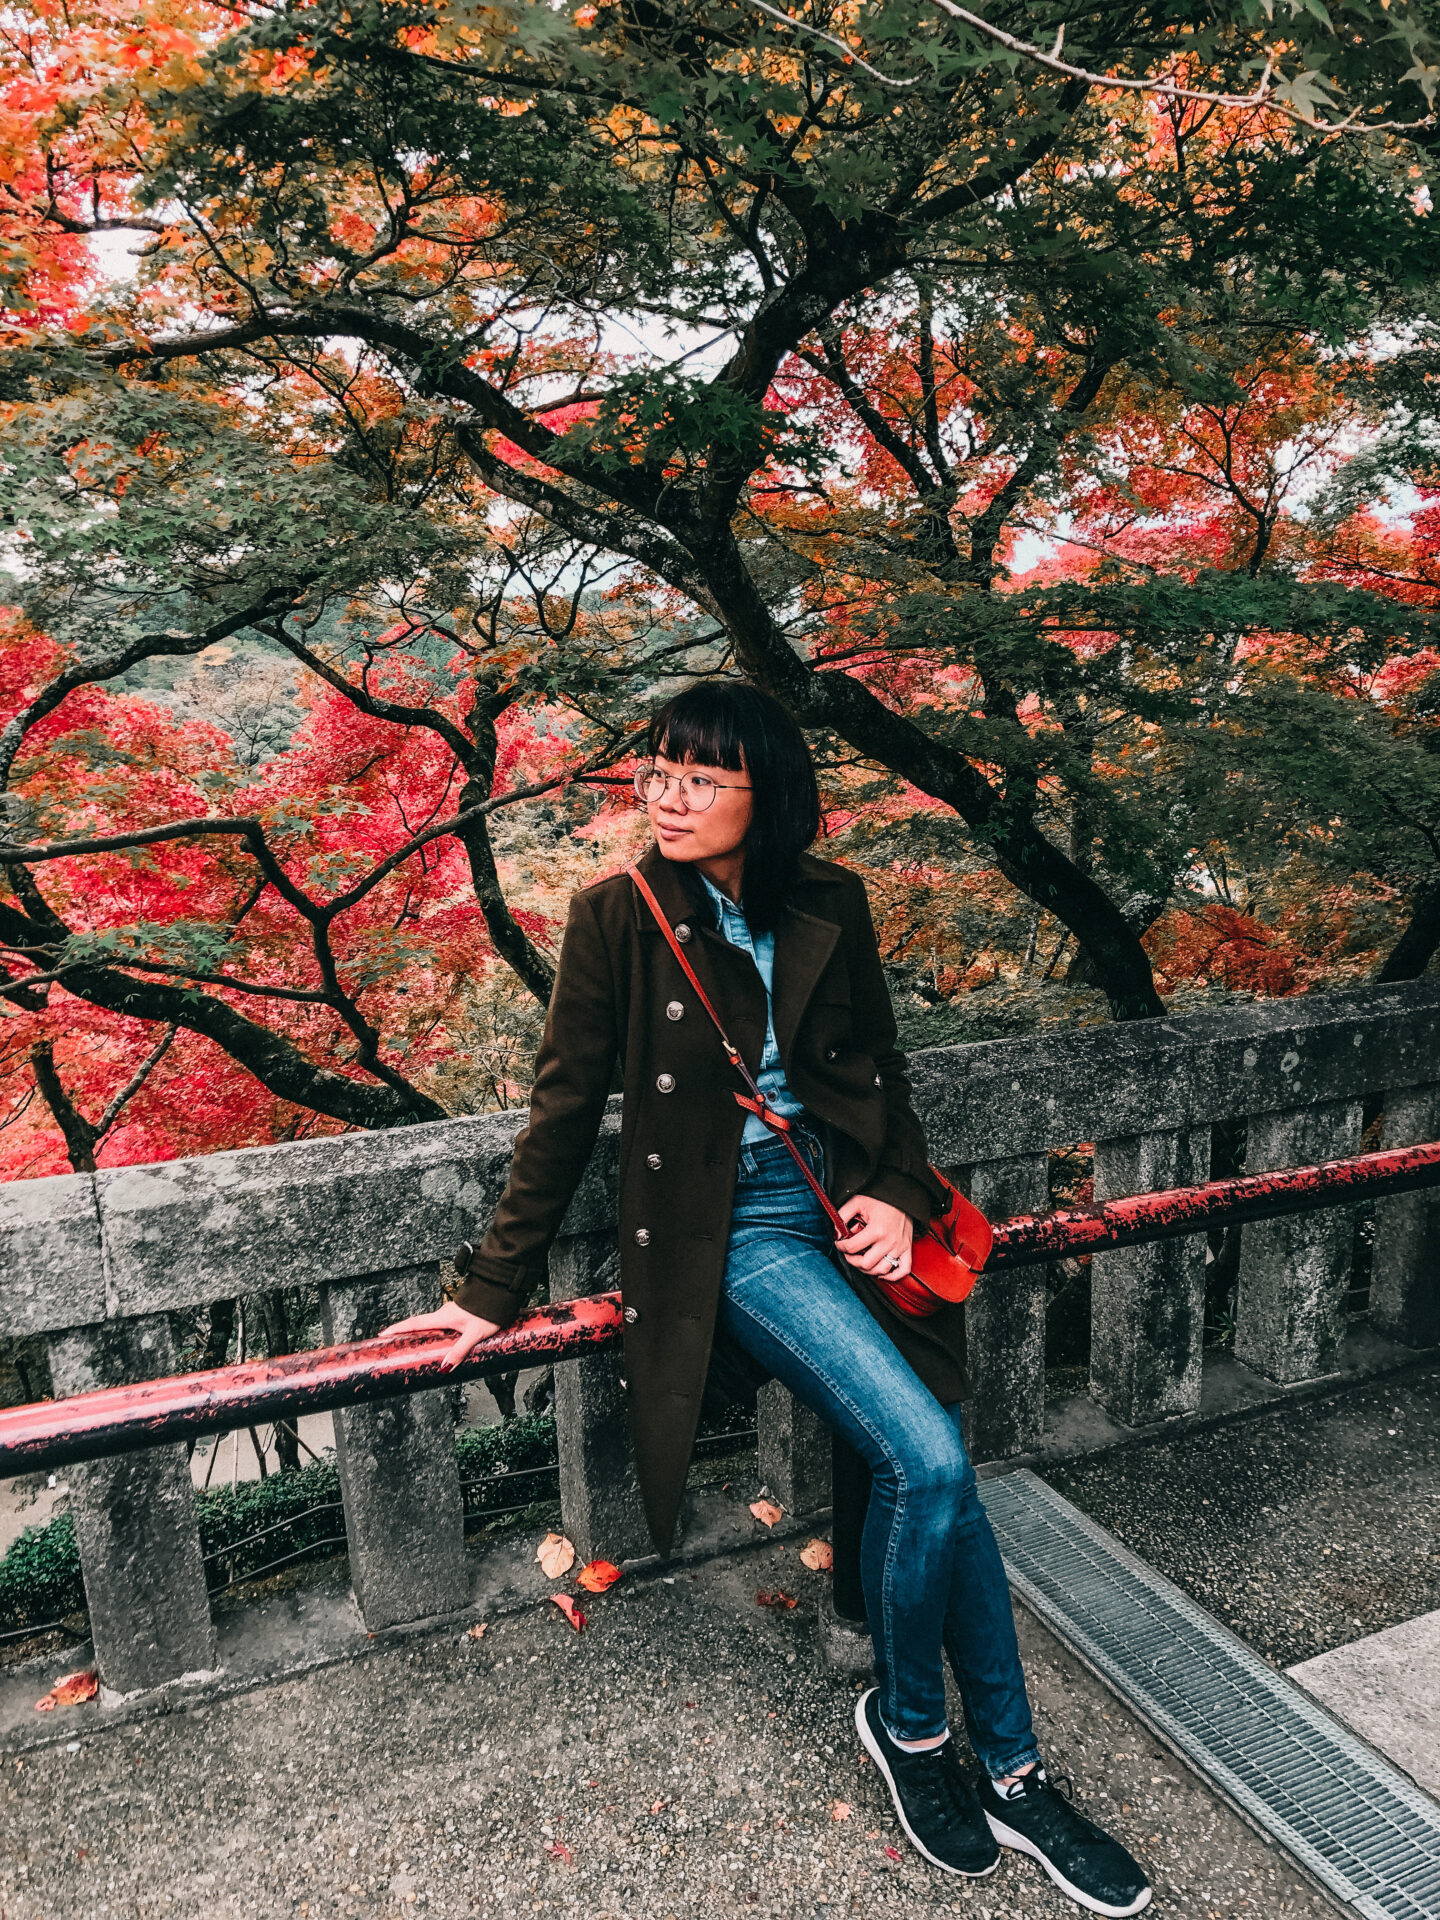 Autumn in Kiyomizu-dera